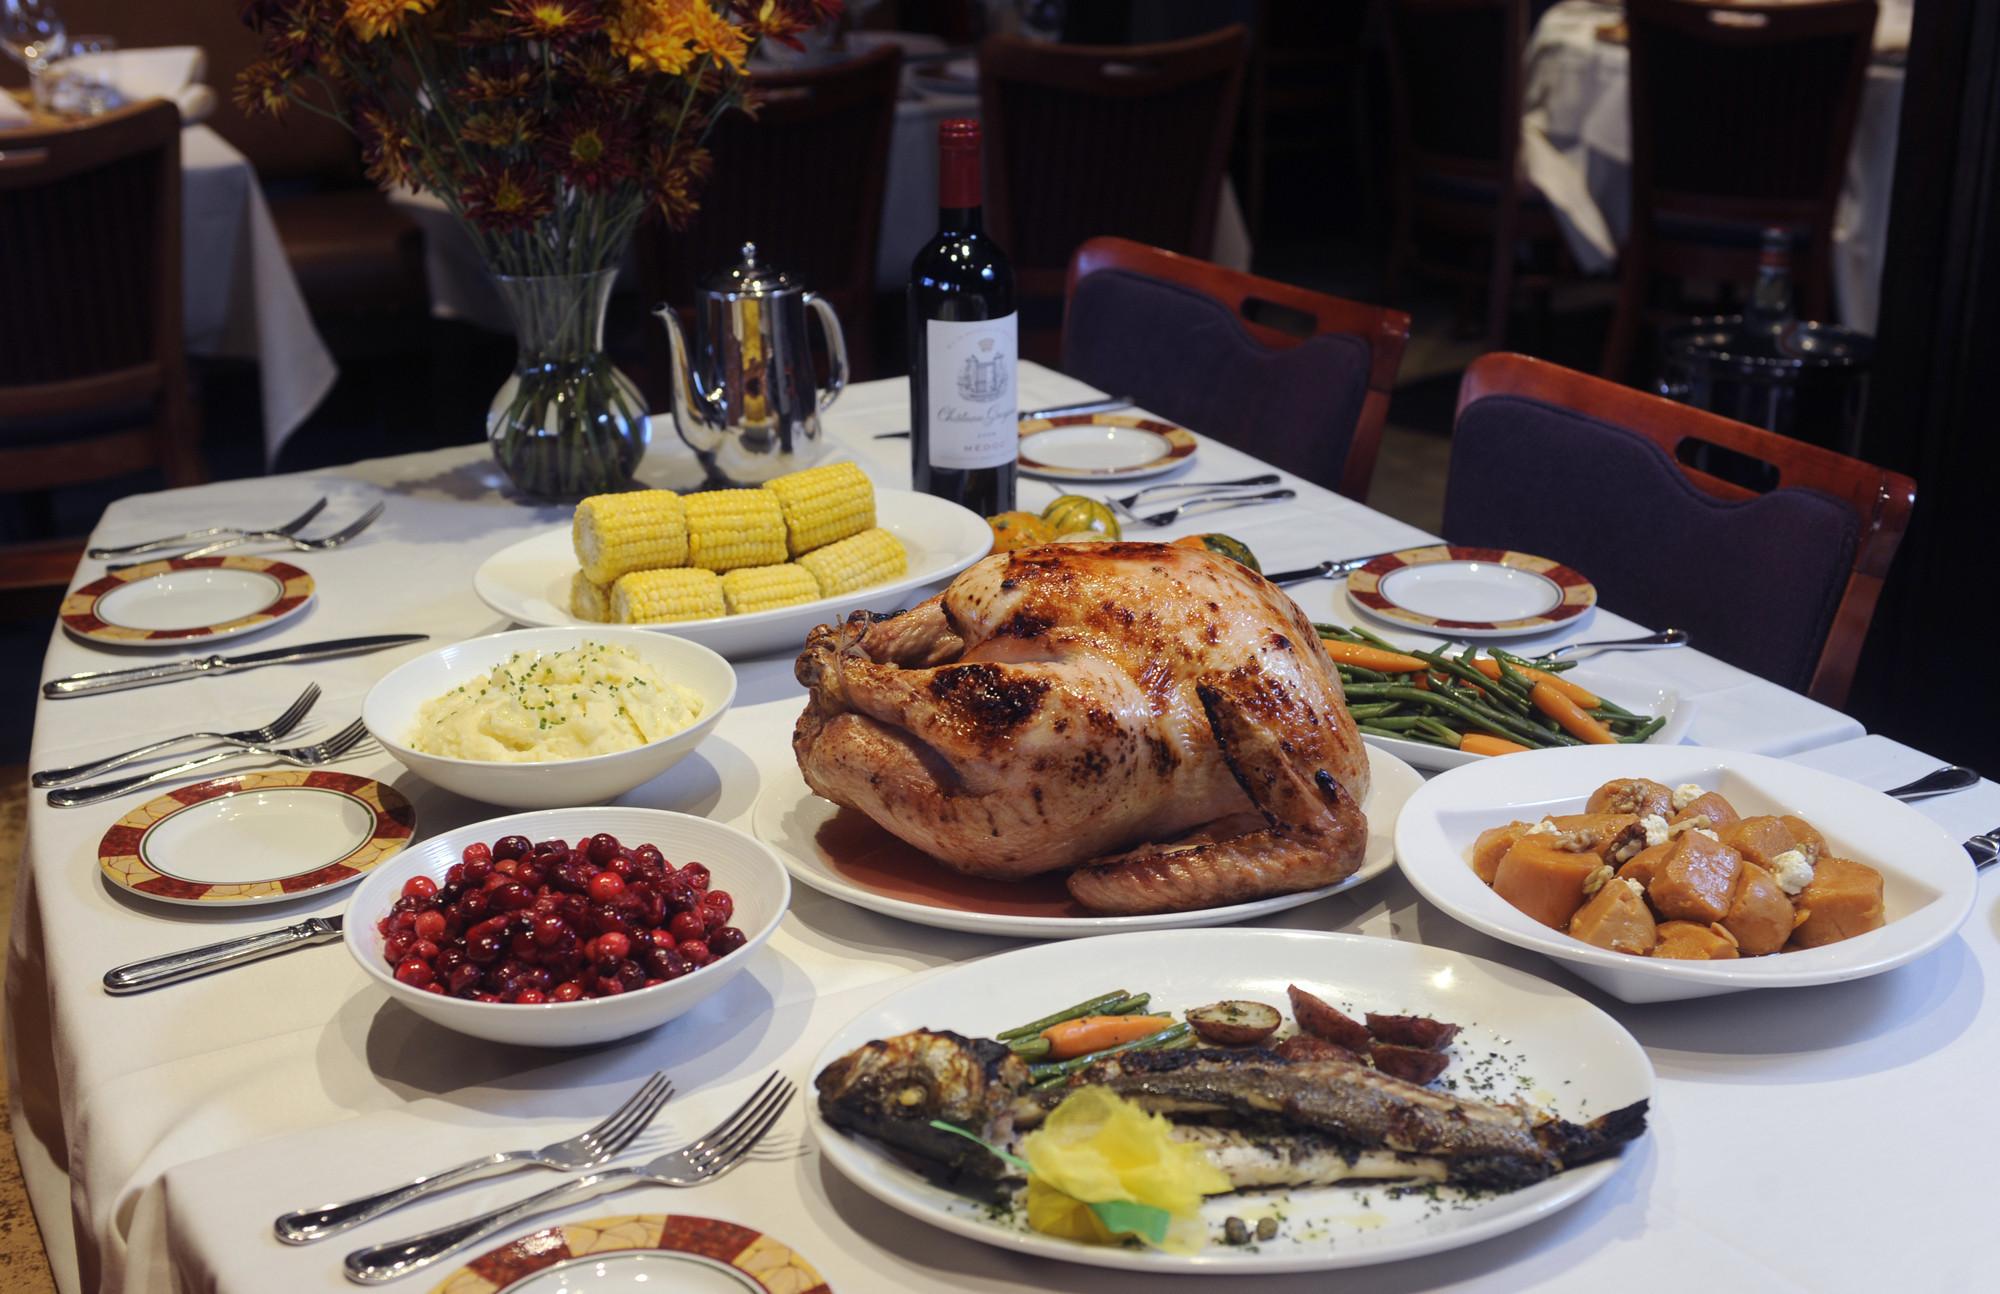 Restaurant Thanksgiving Dinner  10 great Thanksgiving dishes at Baltimore restaurants